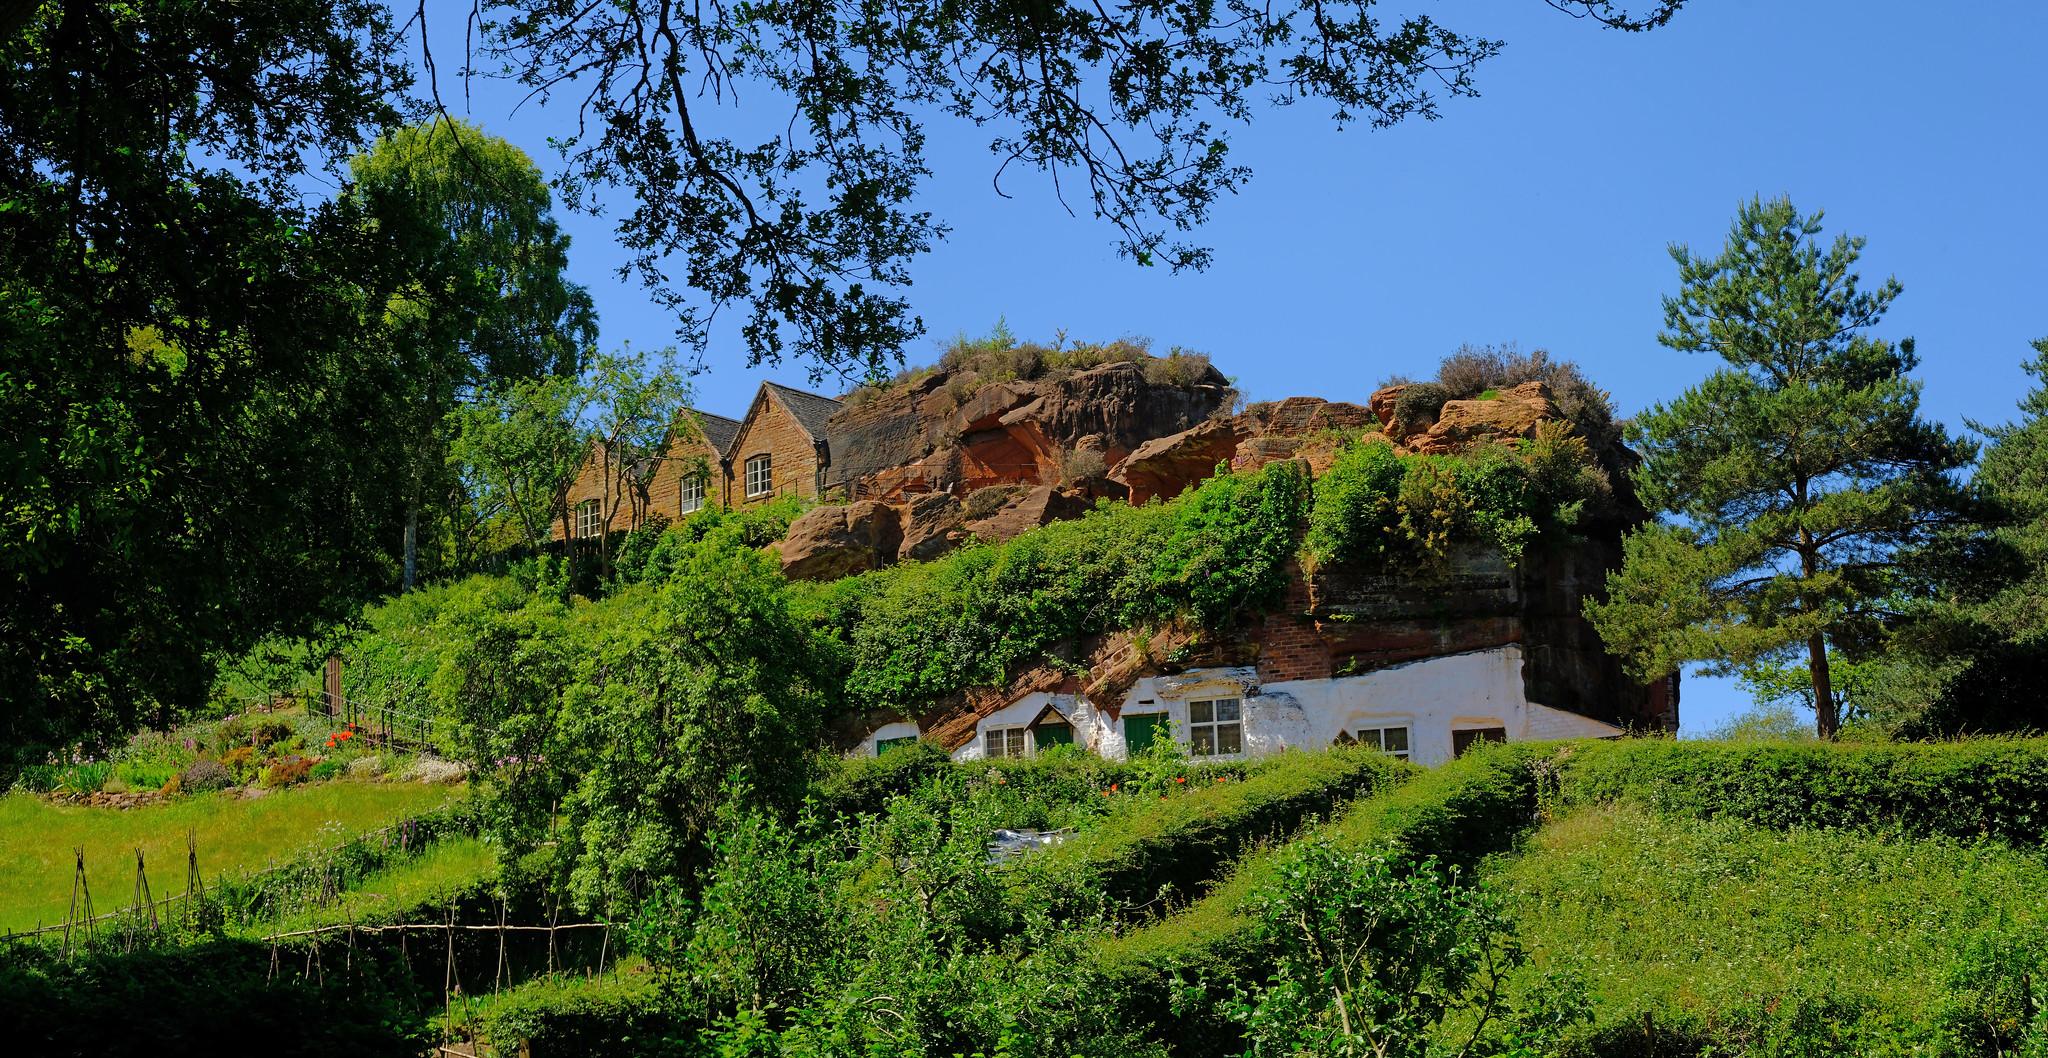 Kinver Edge Rock Houses by Lukas.jpg